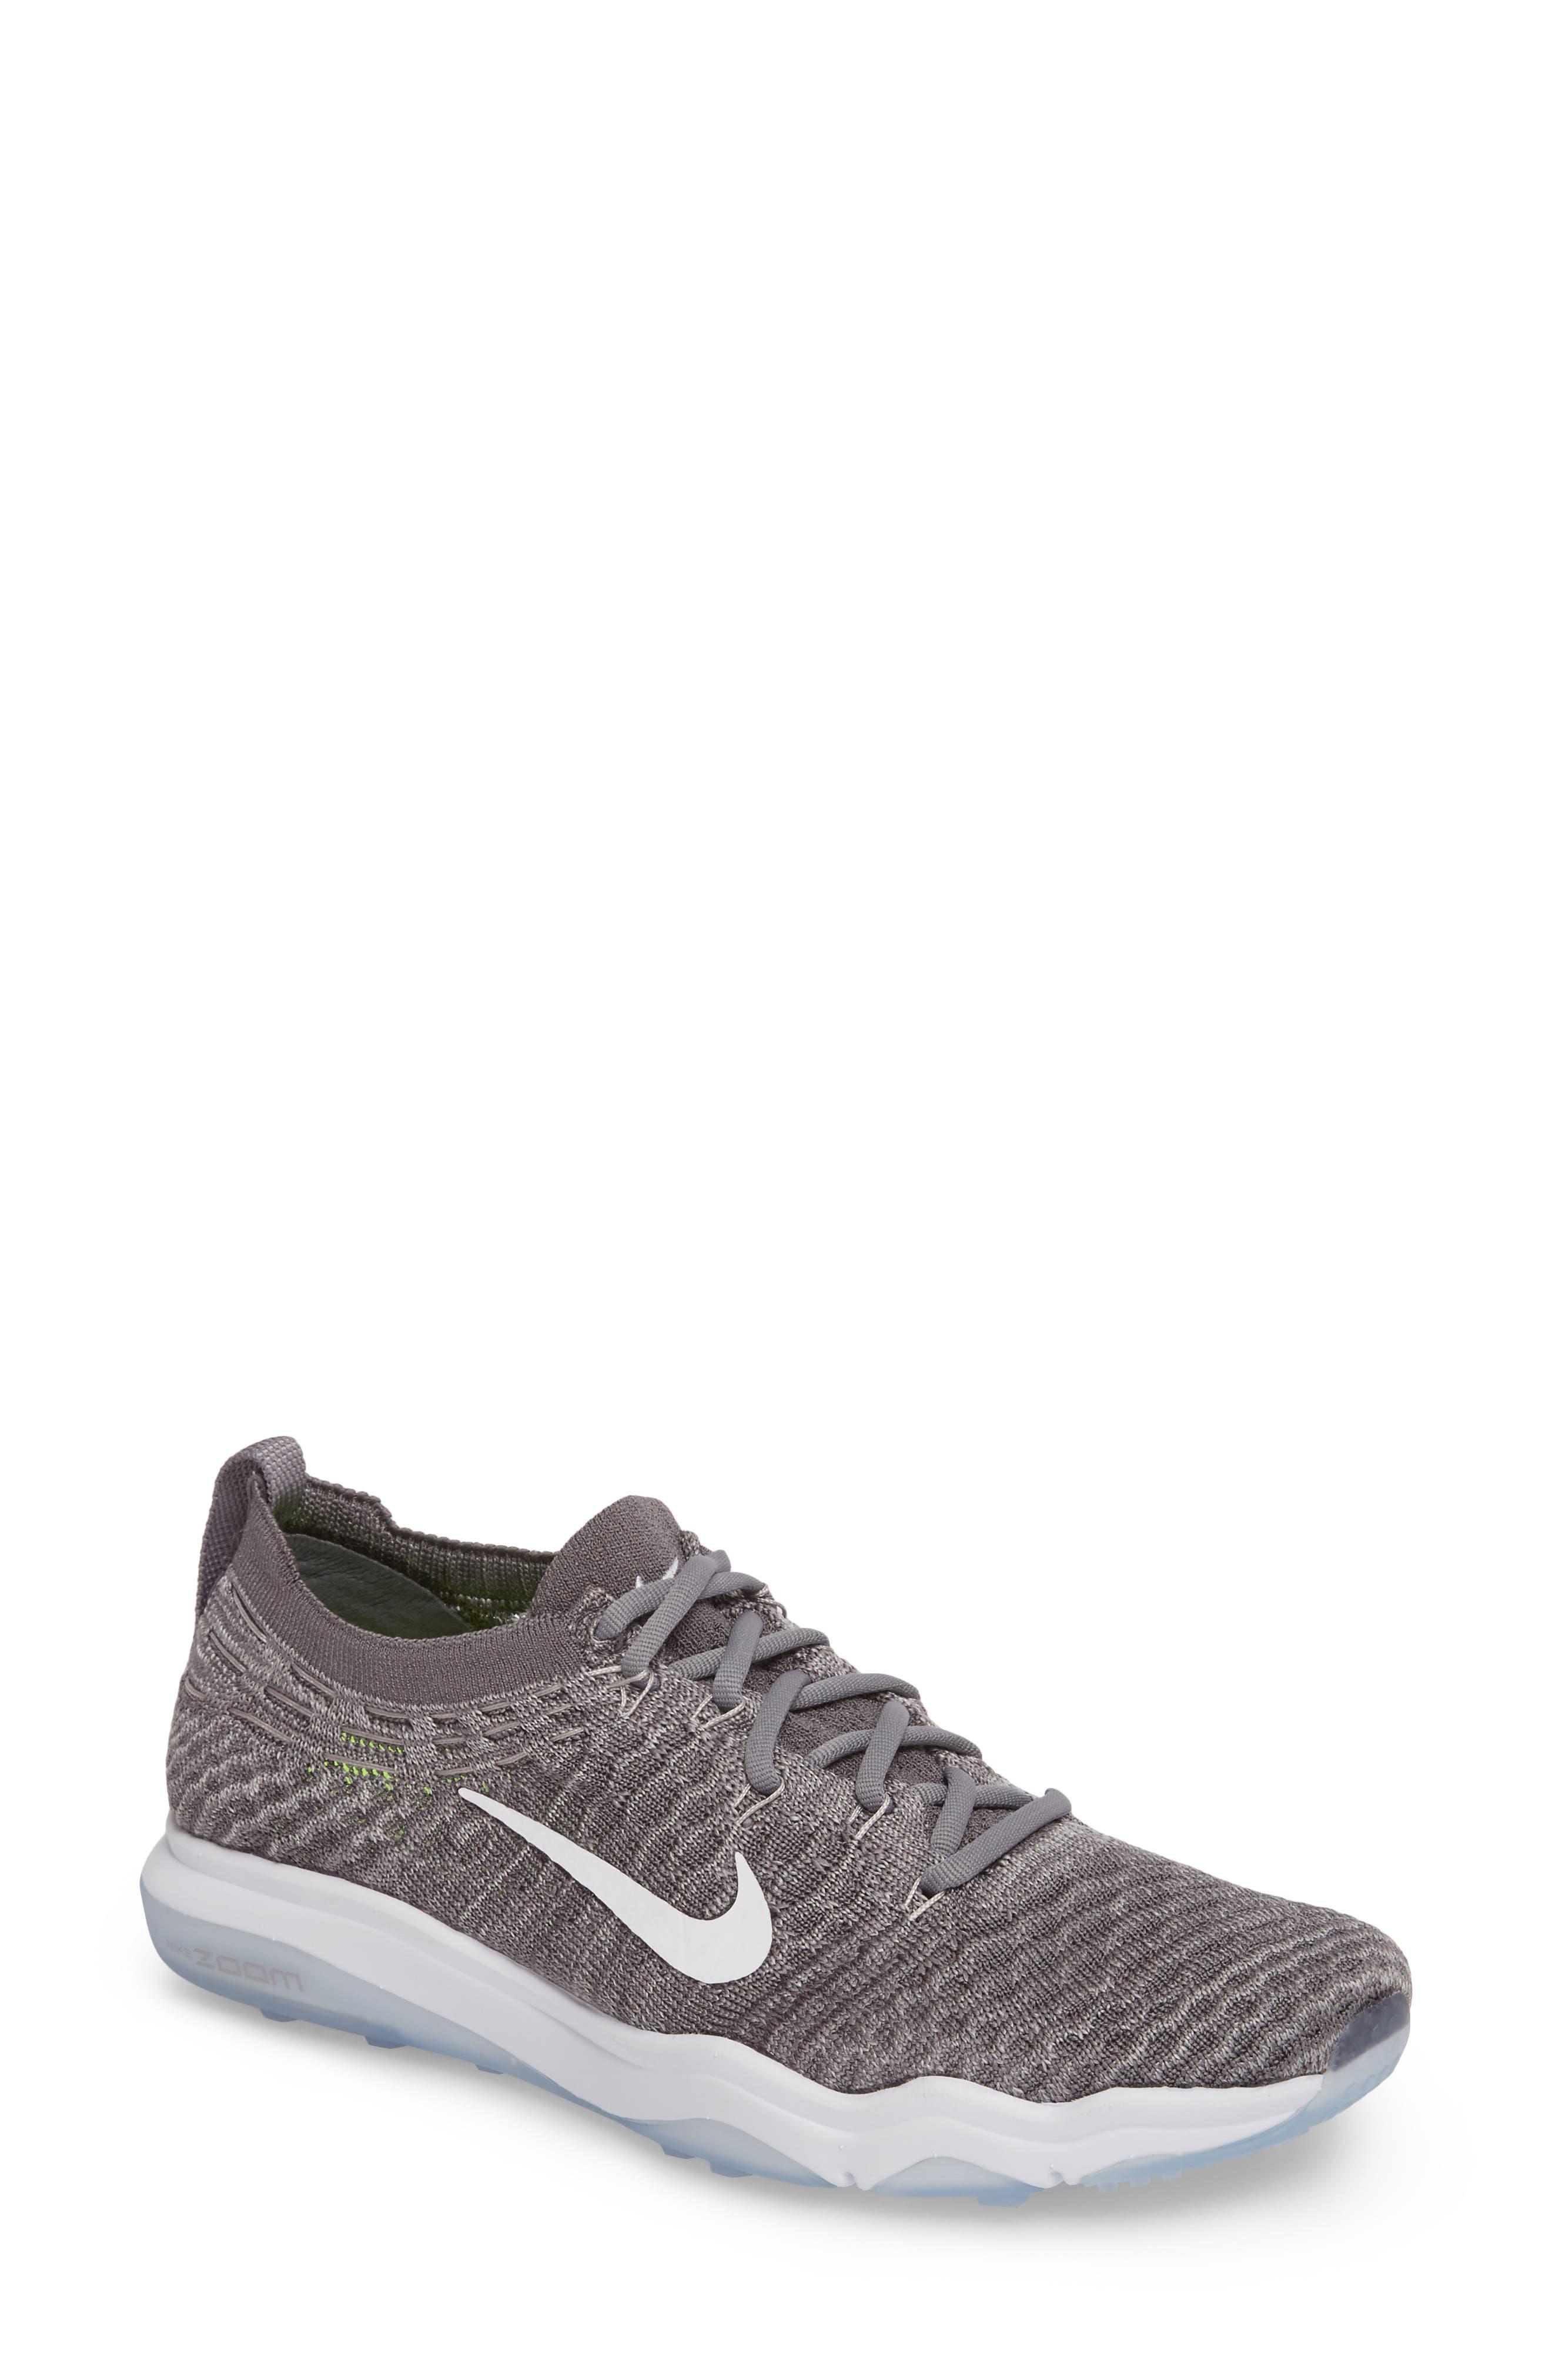 Alternate Image 1 Selected - Nike Air Zoom Fearless Flyknit Lux Training Shoe (Women)